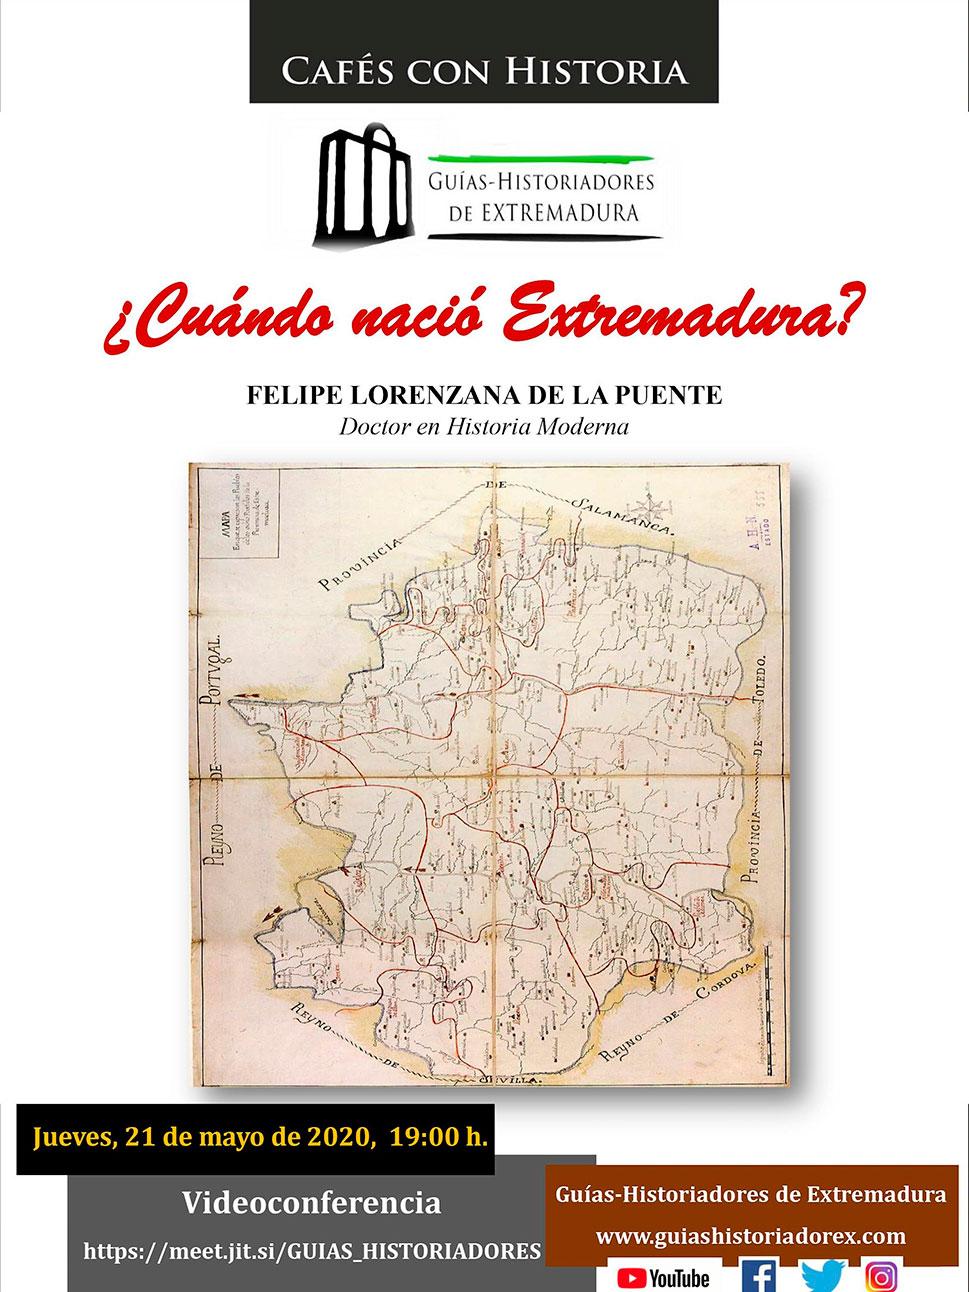 Charlas online sobre la historia de Extremadura